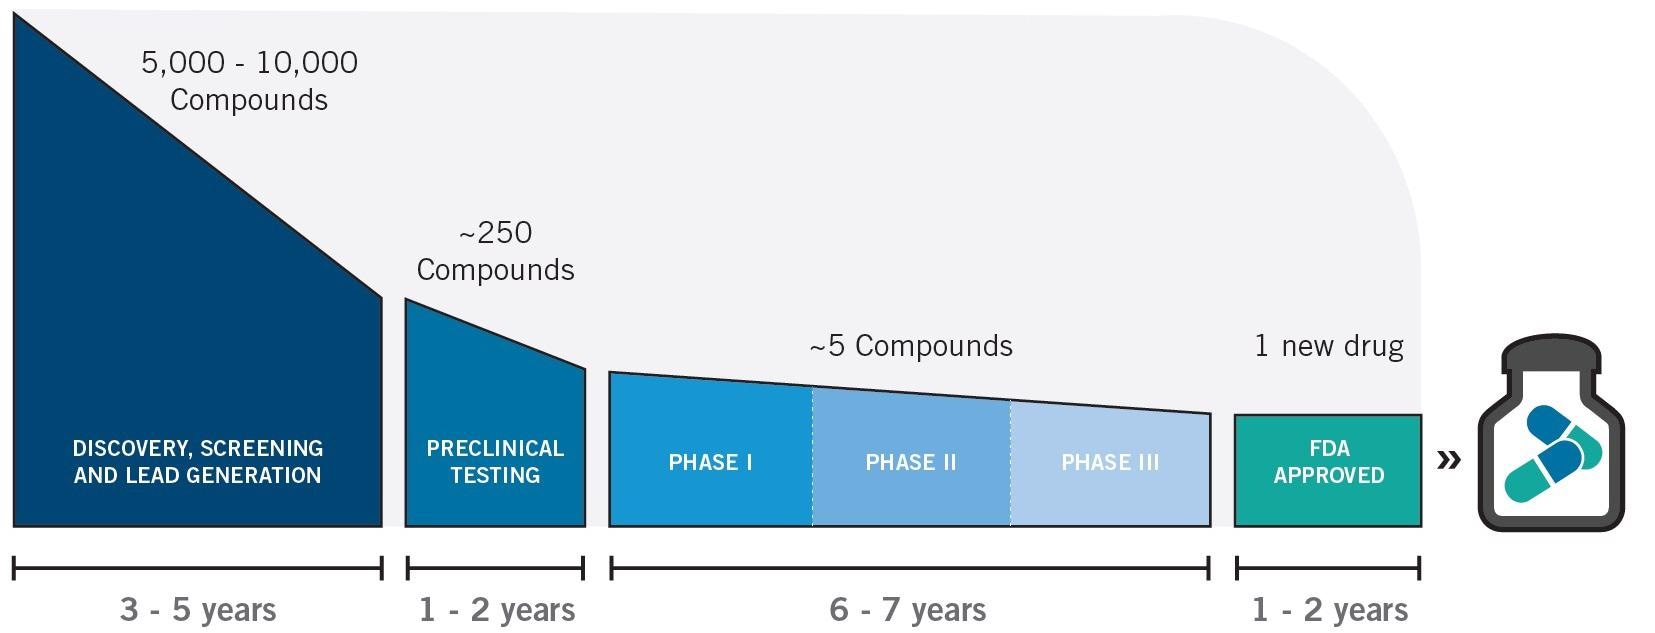 Therapeutics drug and development timeline